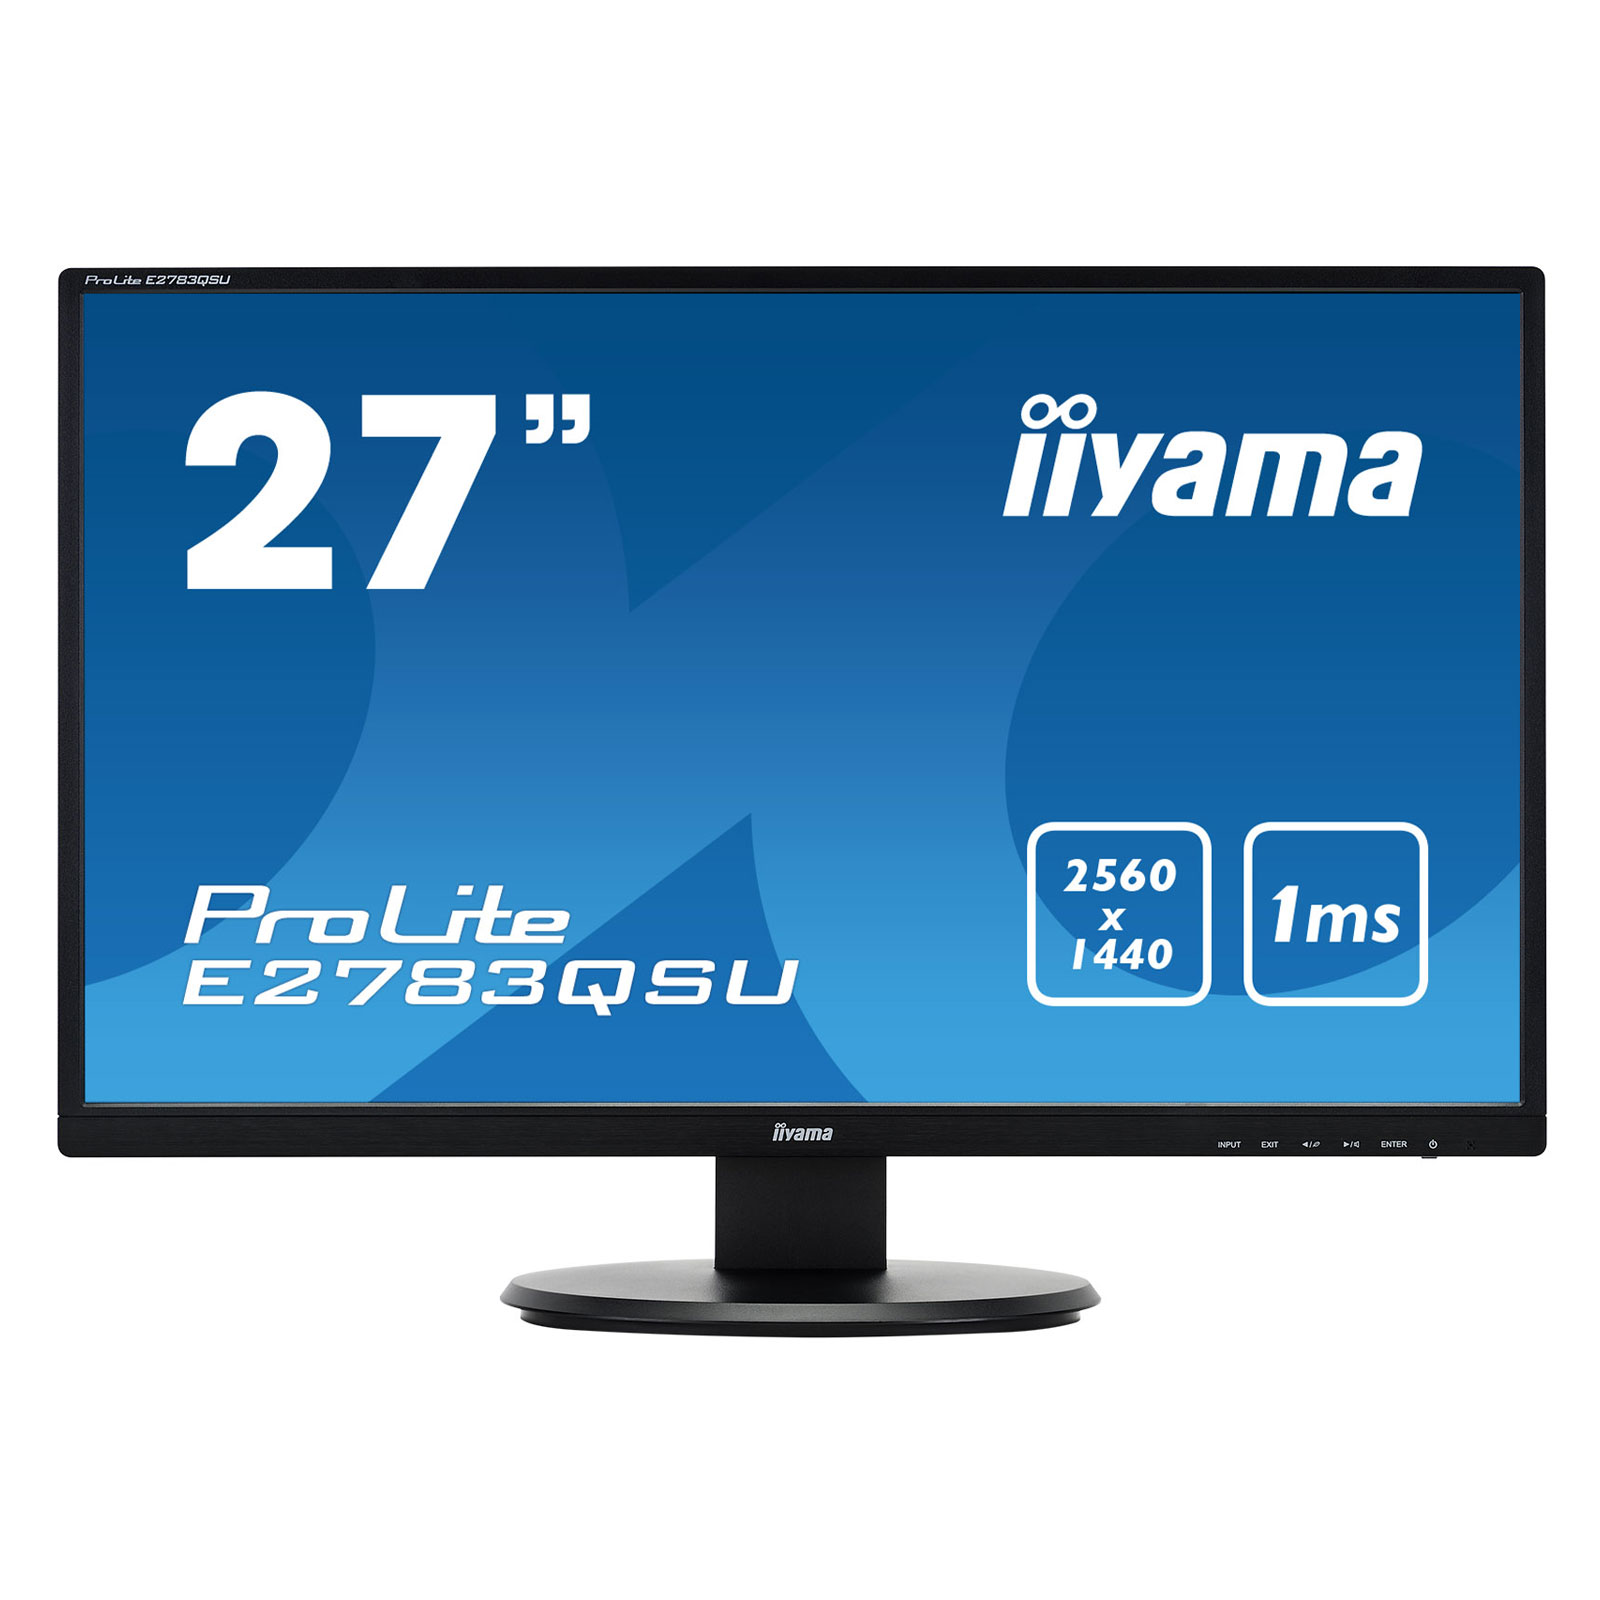 "Iiyama 27""  E2783QSU-B1 - Ecran PC Iiyama - Cybertek.fr - 0"